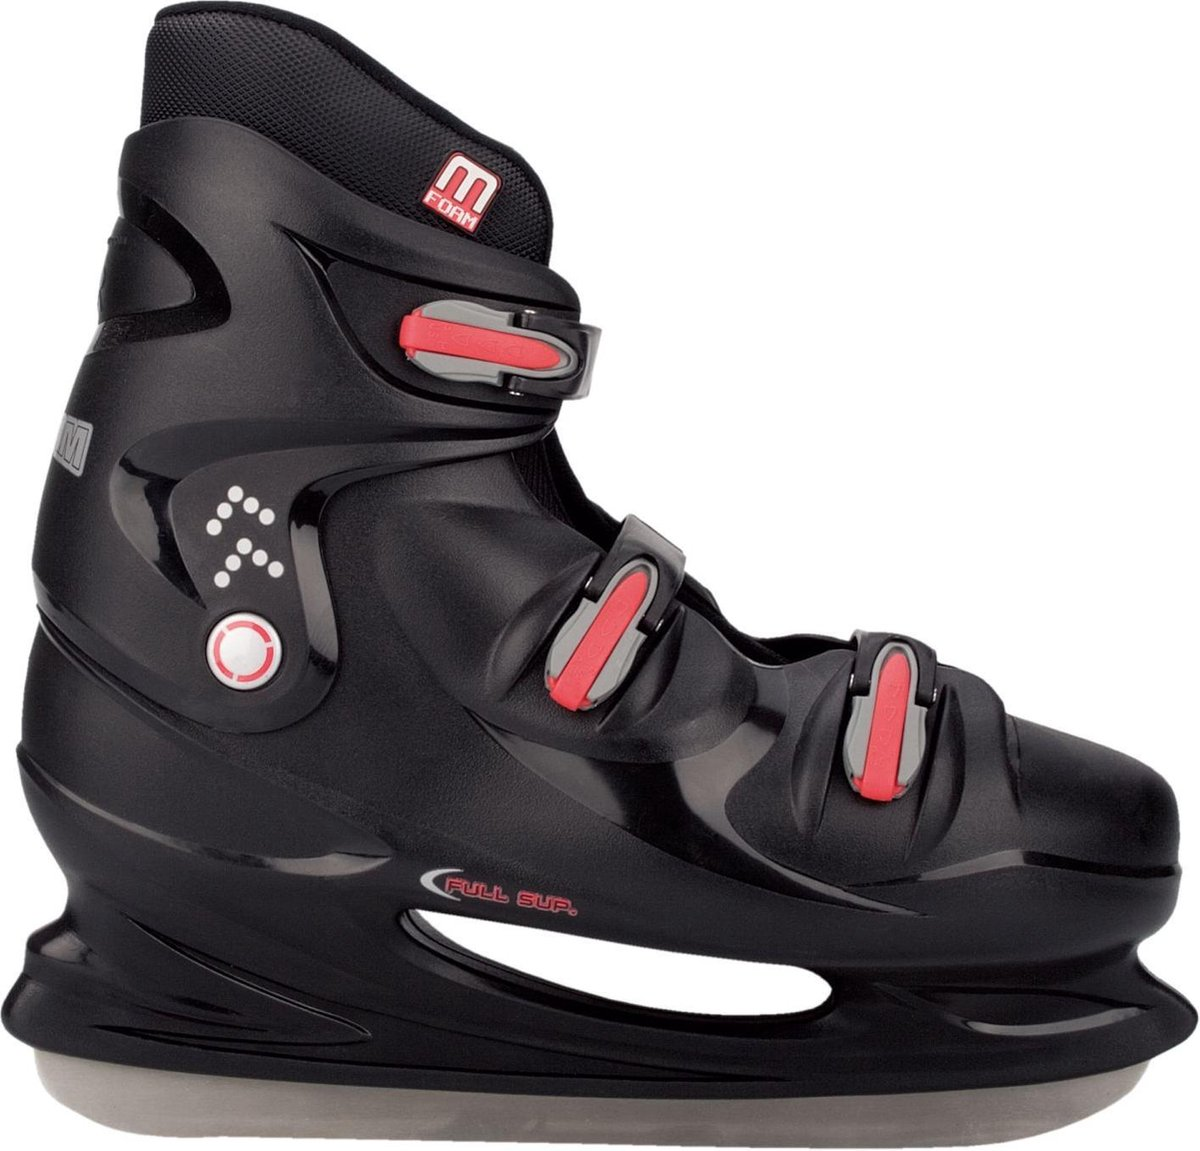 Nijdam IJshockeyschaats XXL - Hardboot - Zwart/Zilver/Rood - 47